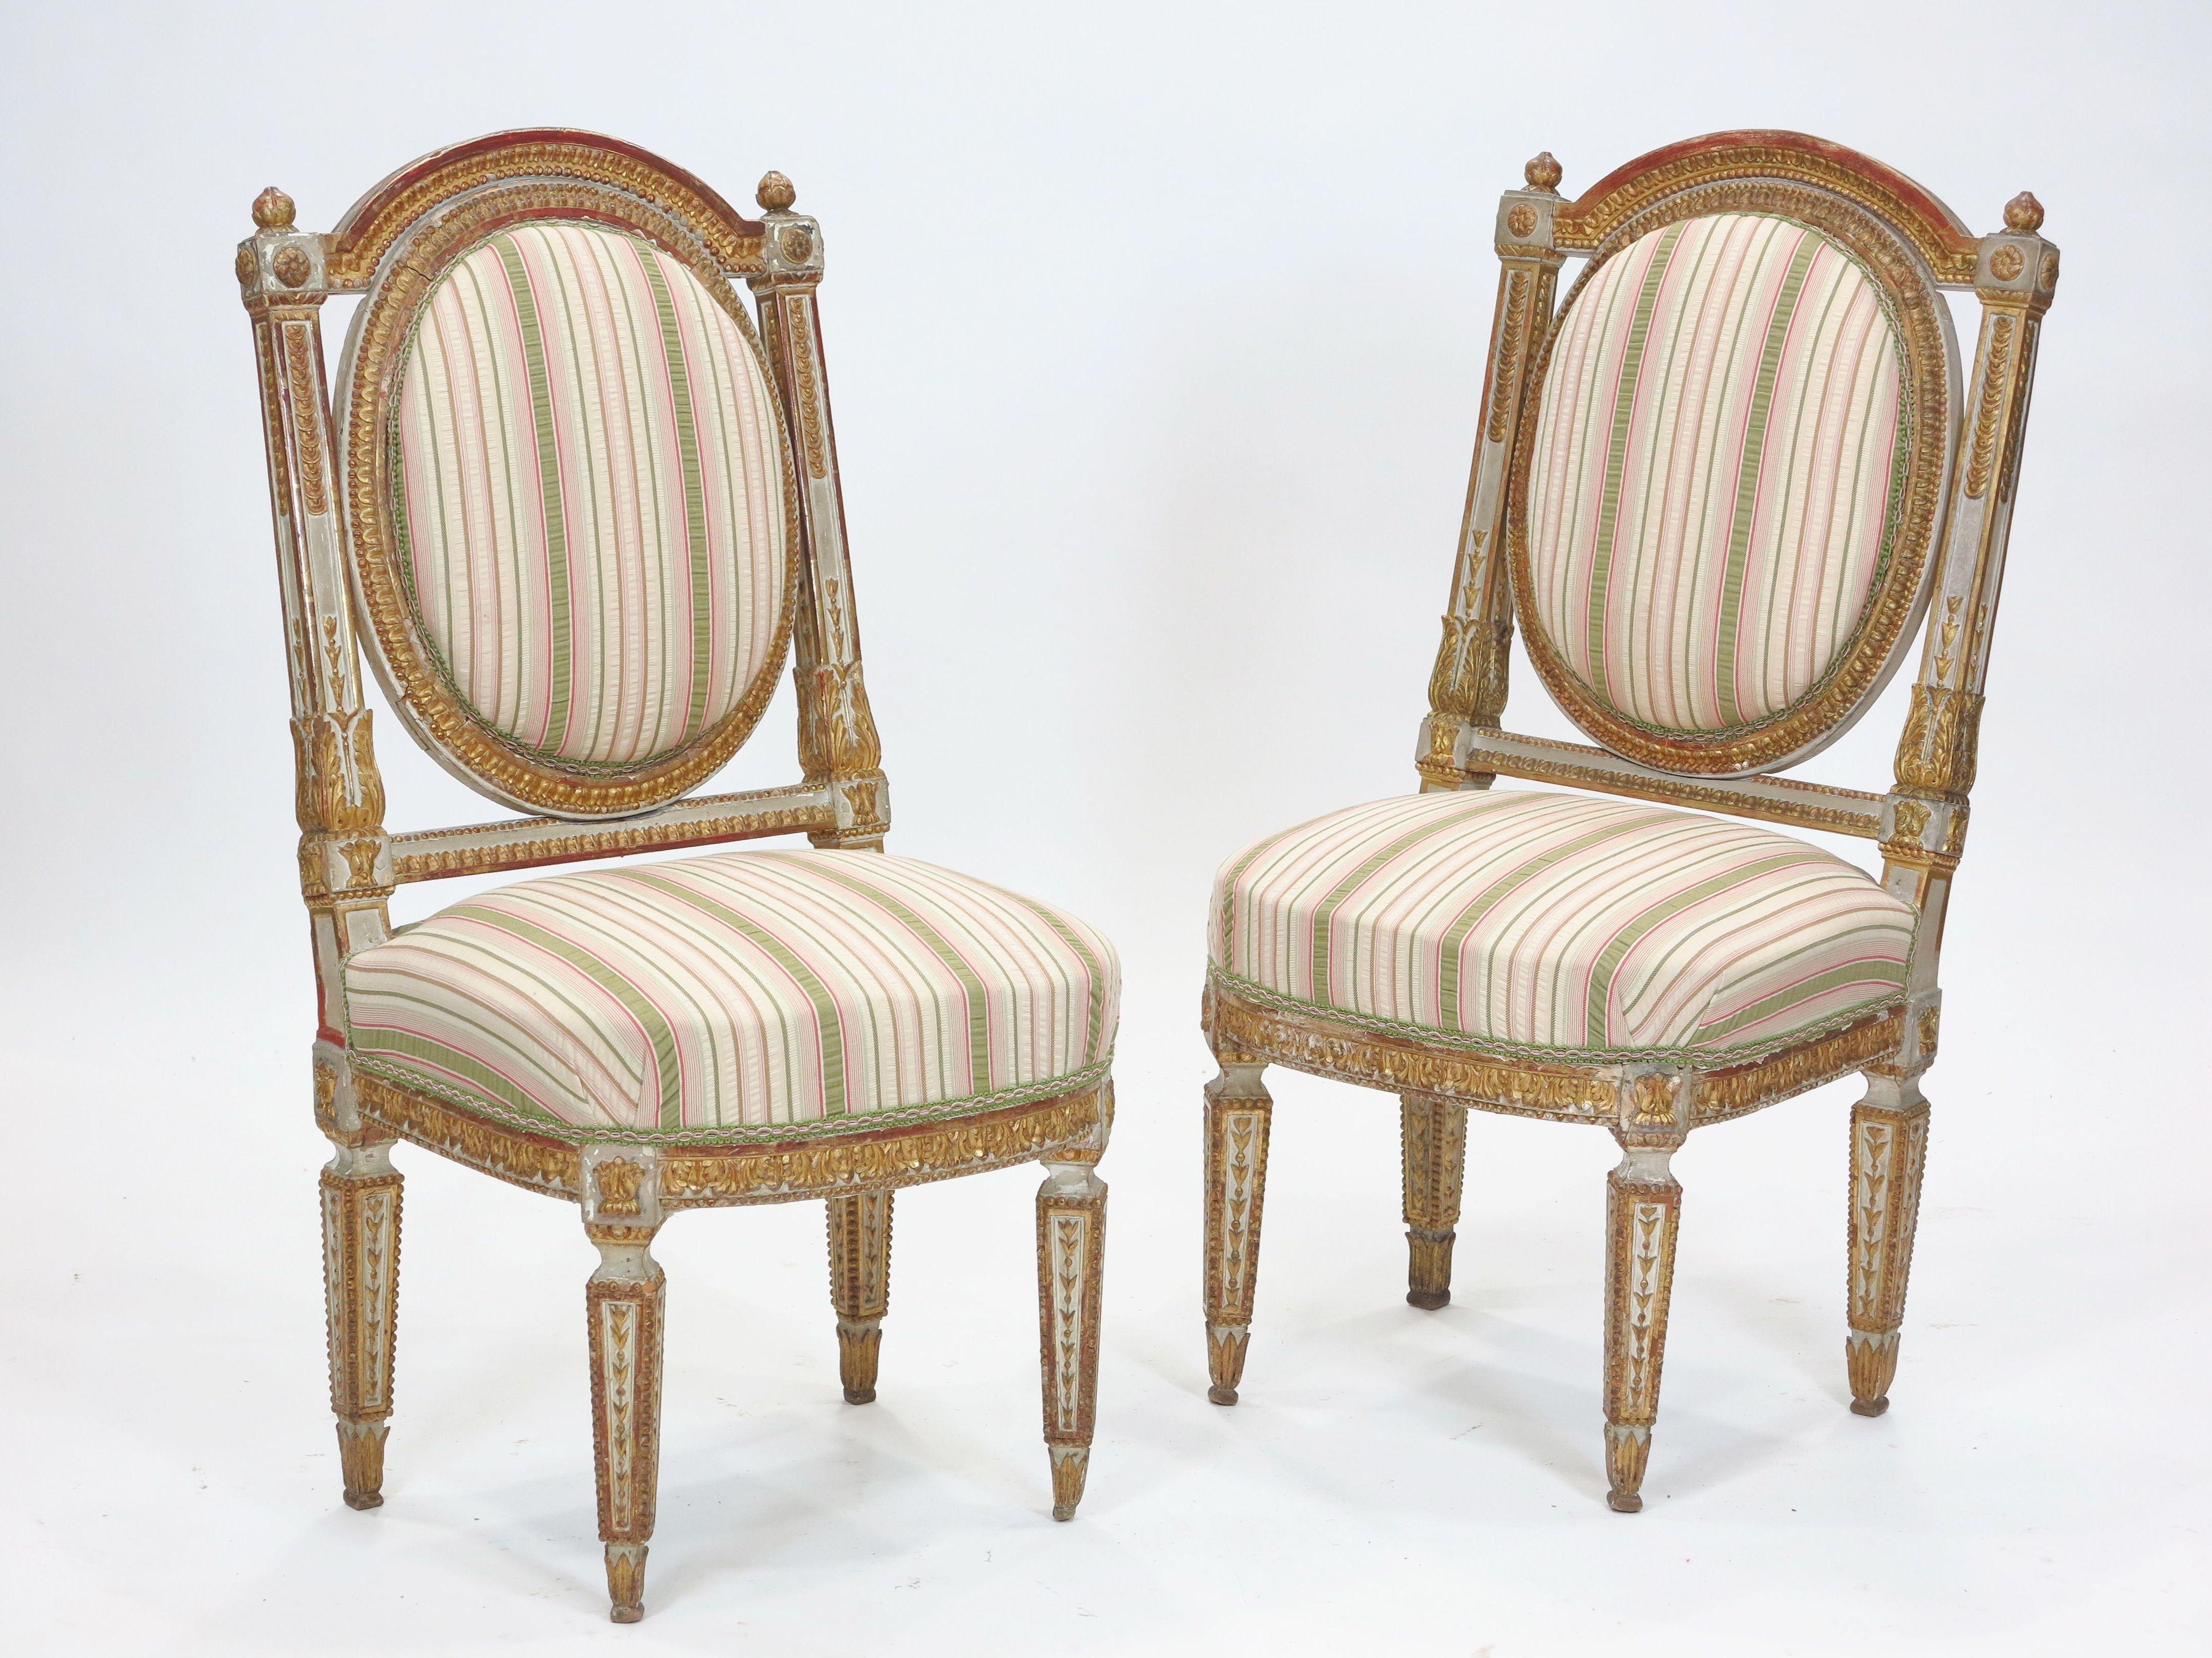 Pareja de sillas de madera tallada: Catálogo de Goya Subastas